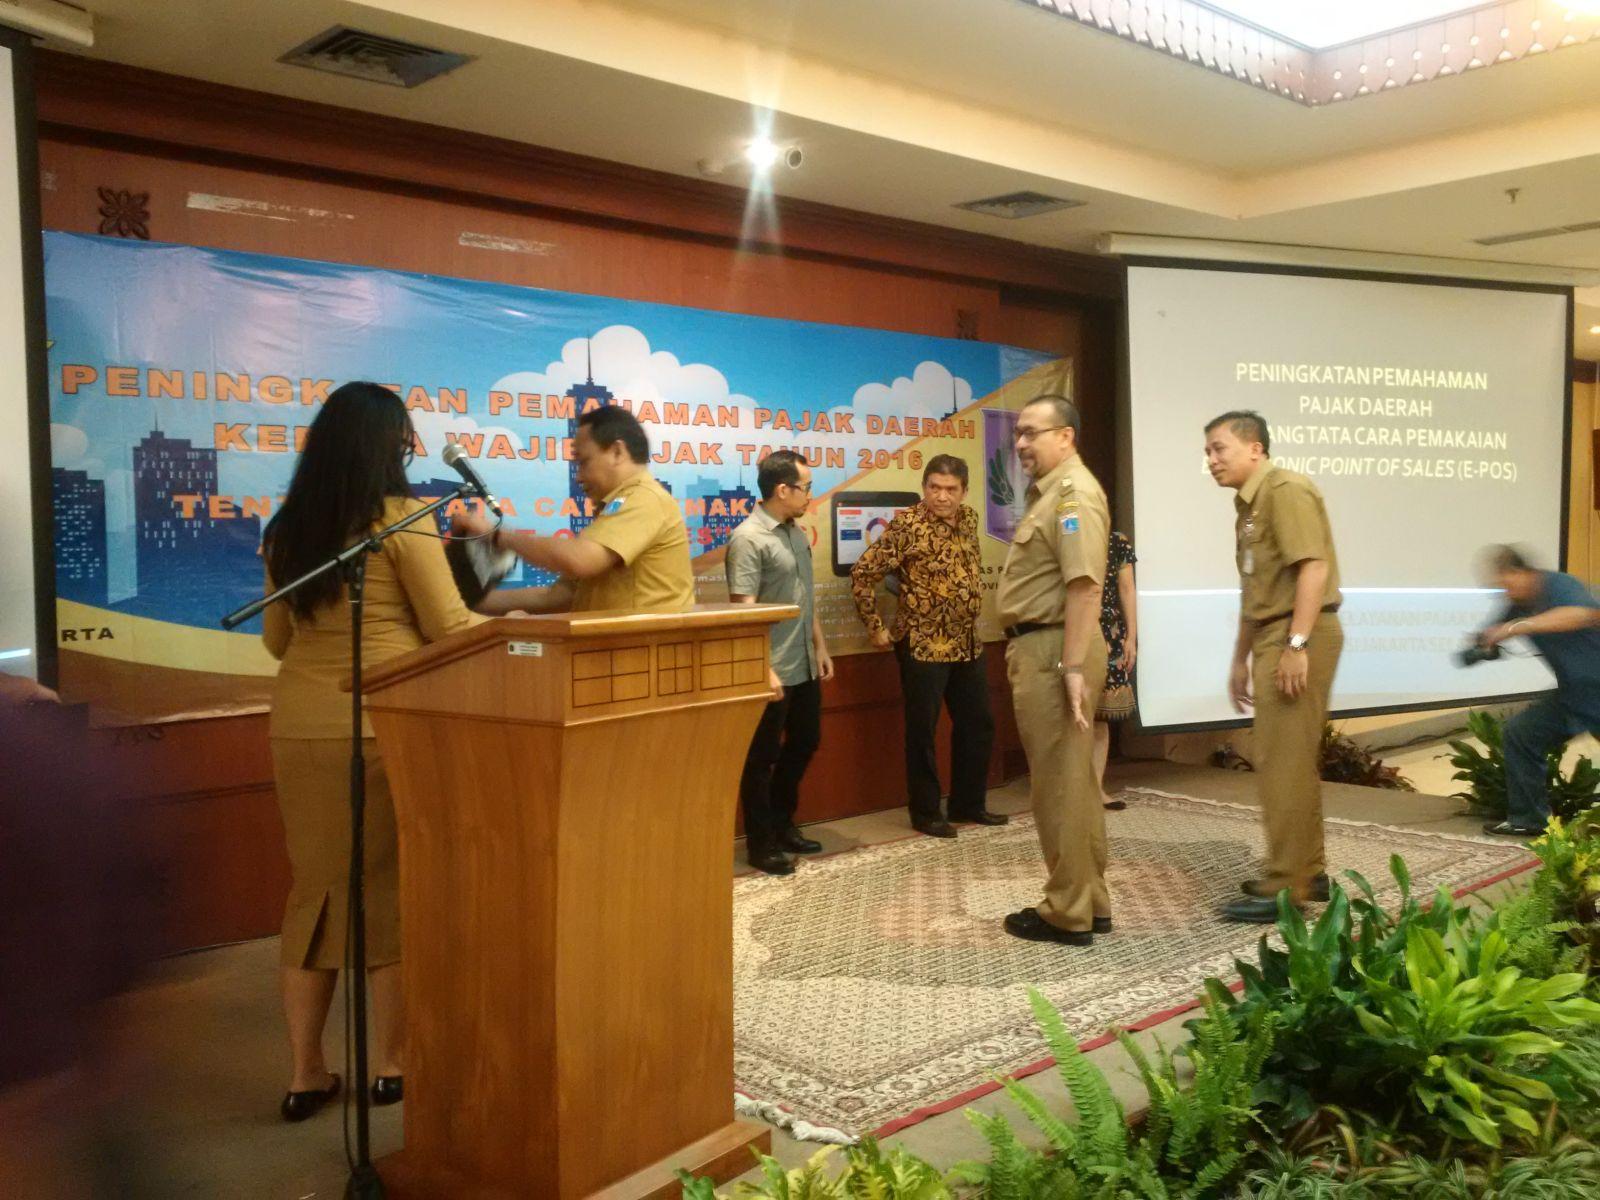 Penyampaian Alat E-Pos di Sudin Pajak Jakarta Selatan